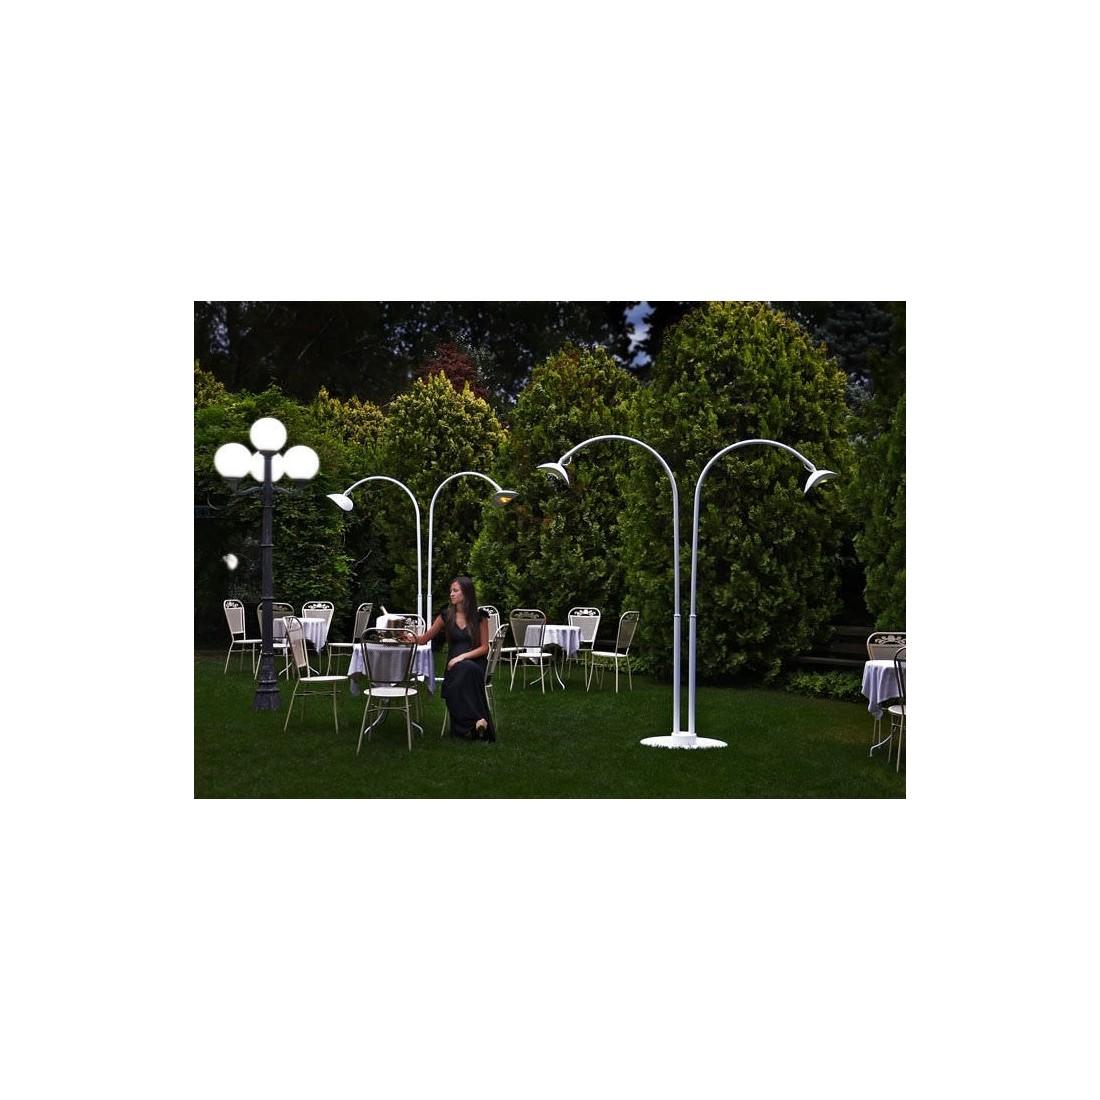 Lampe chauffante infrarouge mobile double blanche phormalab confort jardin - Lampe chauffante infrarouge ...